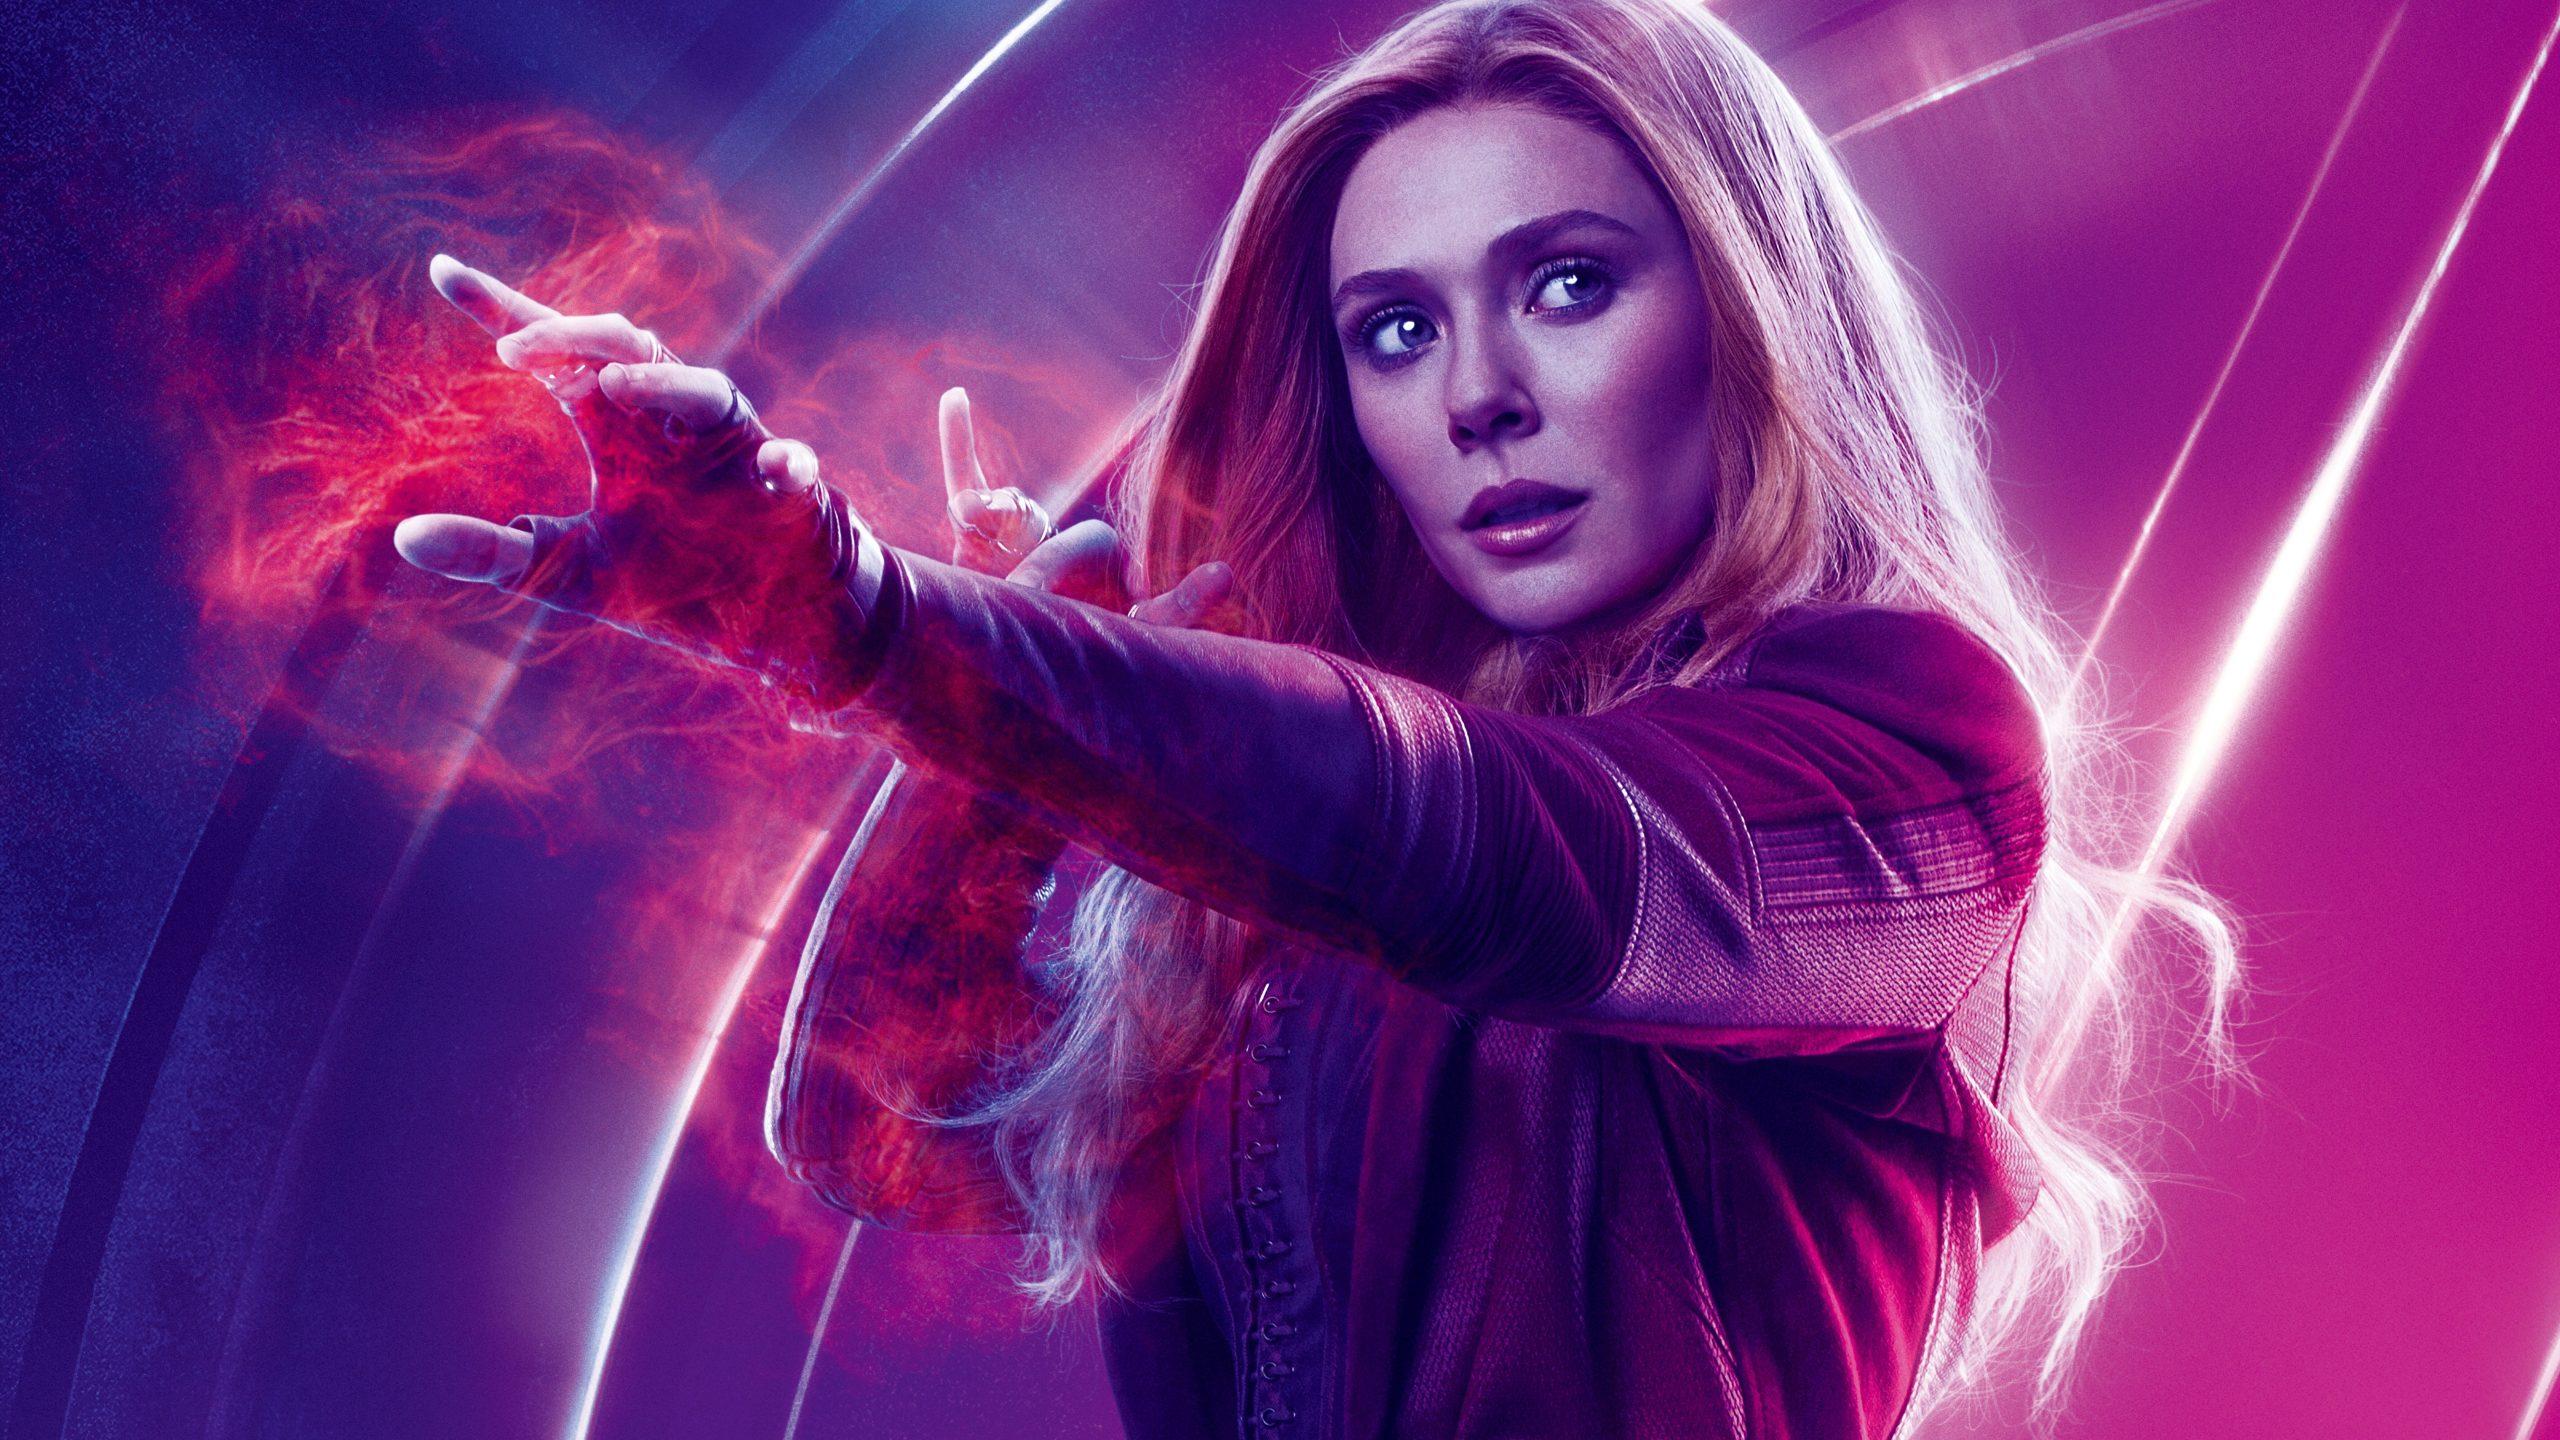 Avengers Infinity War 2018 Thanos 4k Uhd 3 2 3840x2560: Avengers: Infinity War (2018) Scarlet Witch 8K Ultra HD